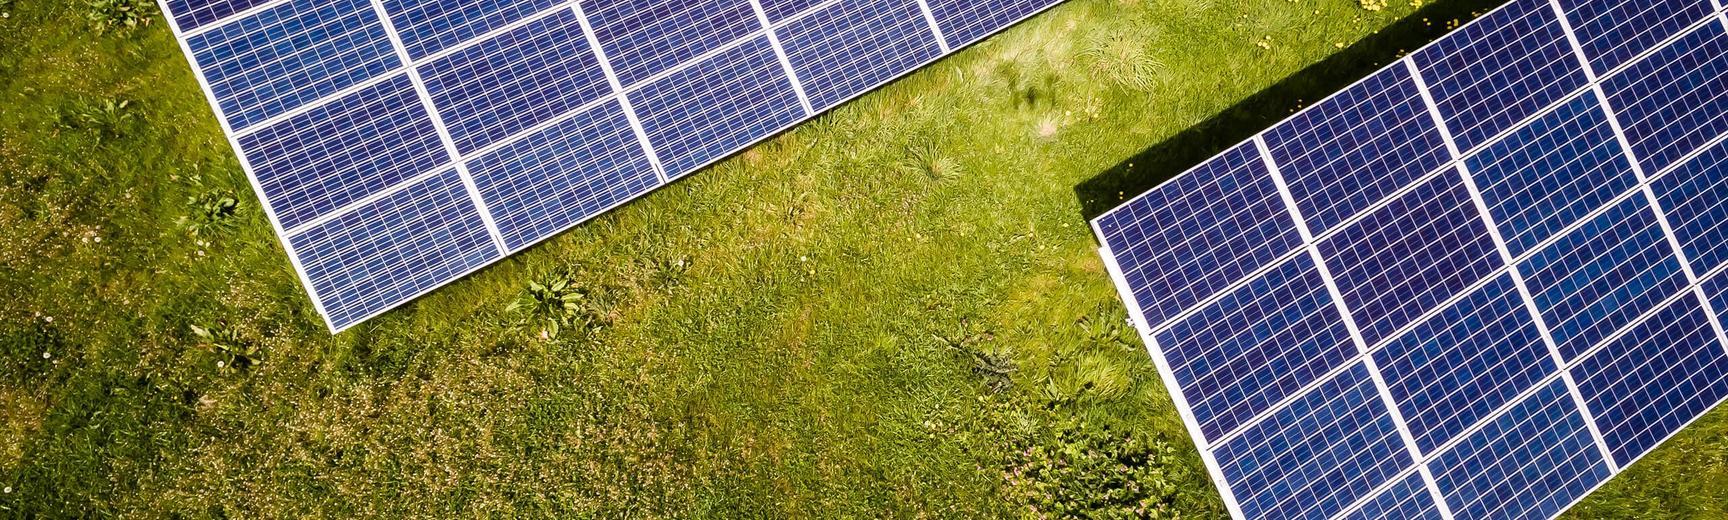 Solar panels on a lawn